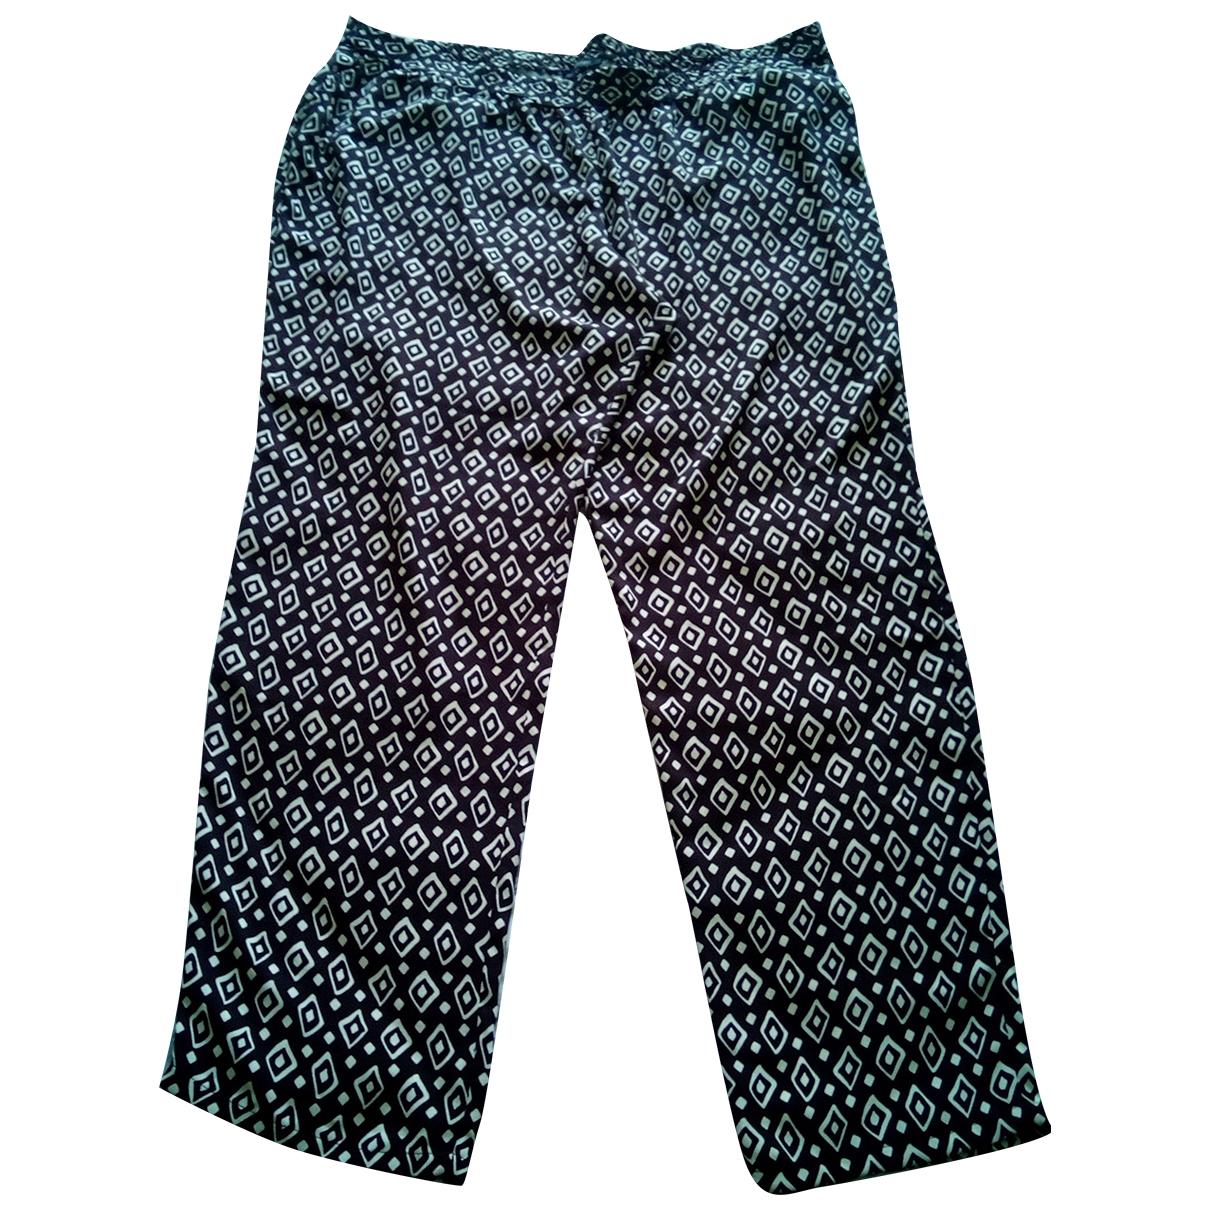 Elena Miro \N Multicolour Spandex Trousers for Women 54-56 IT